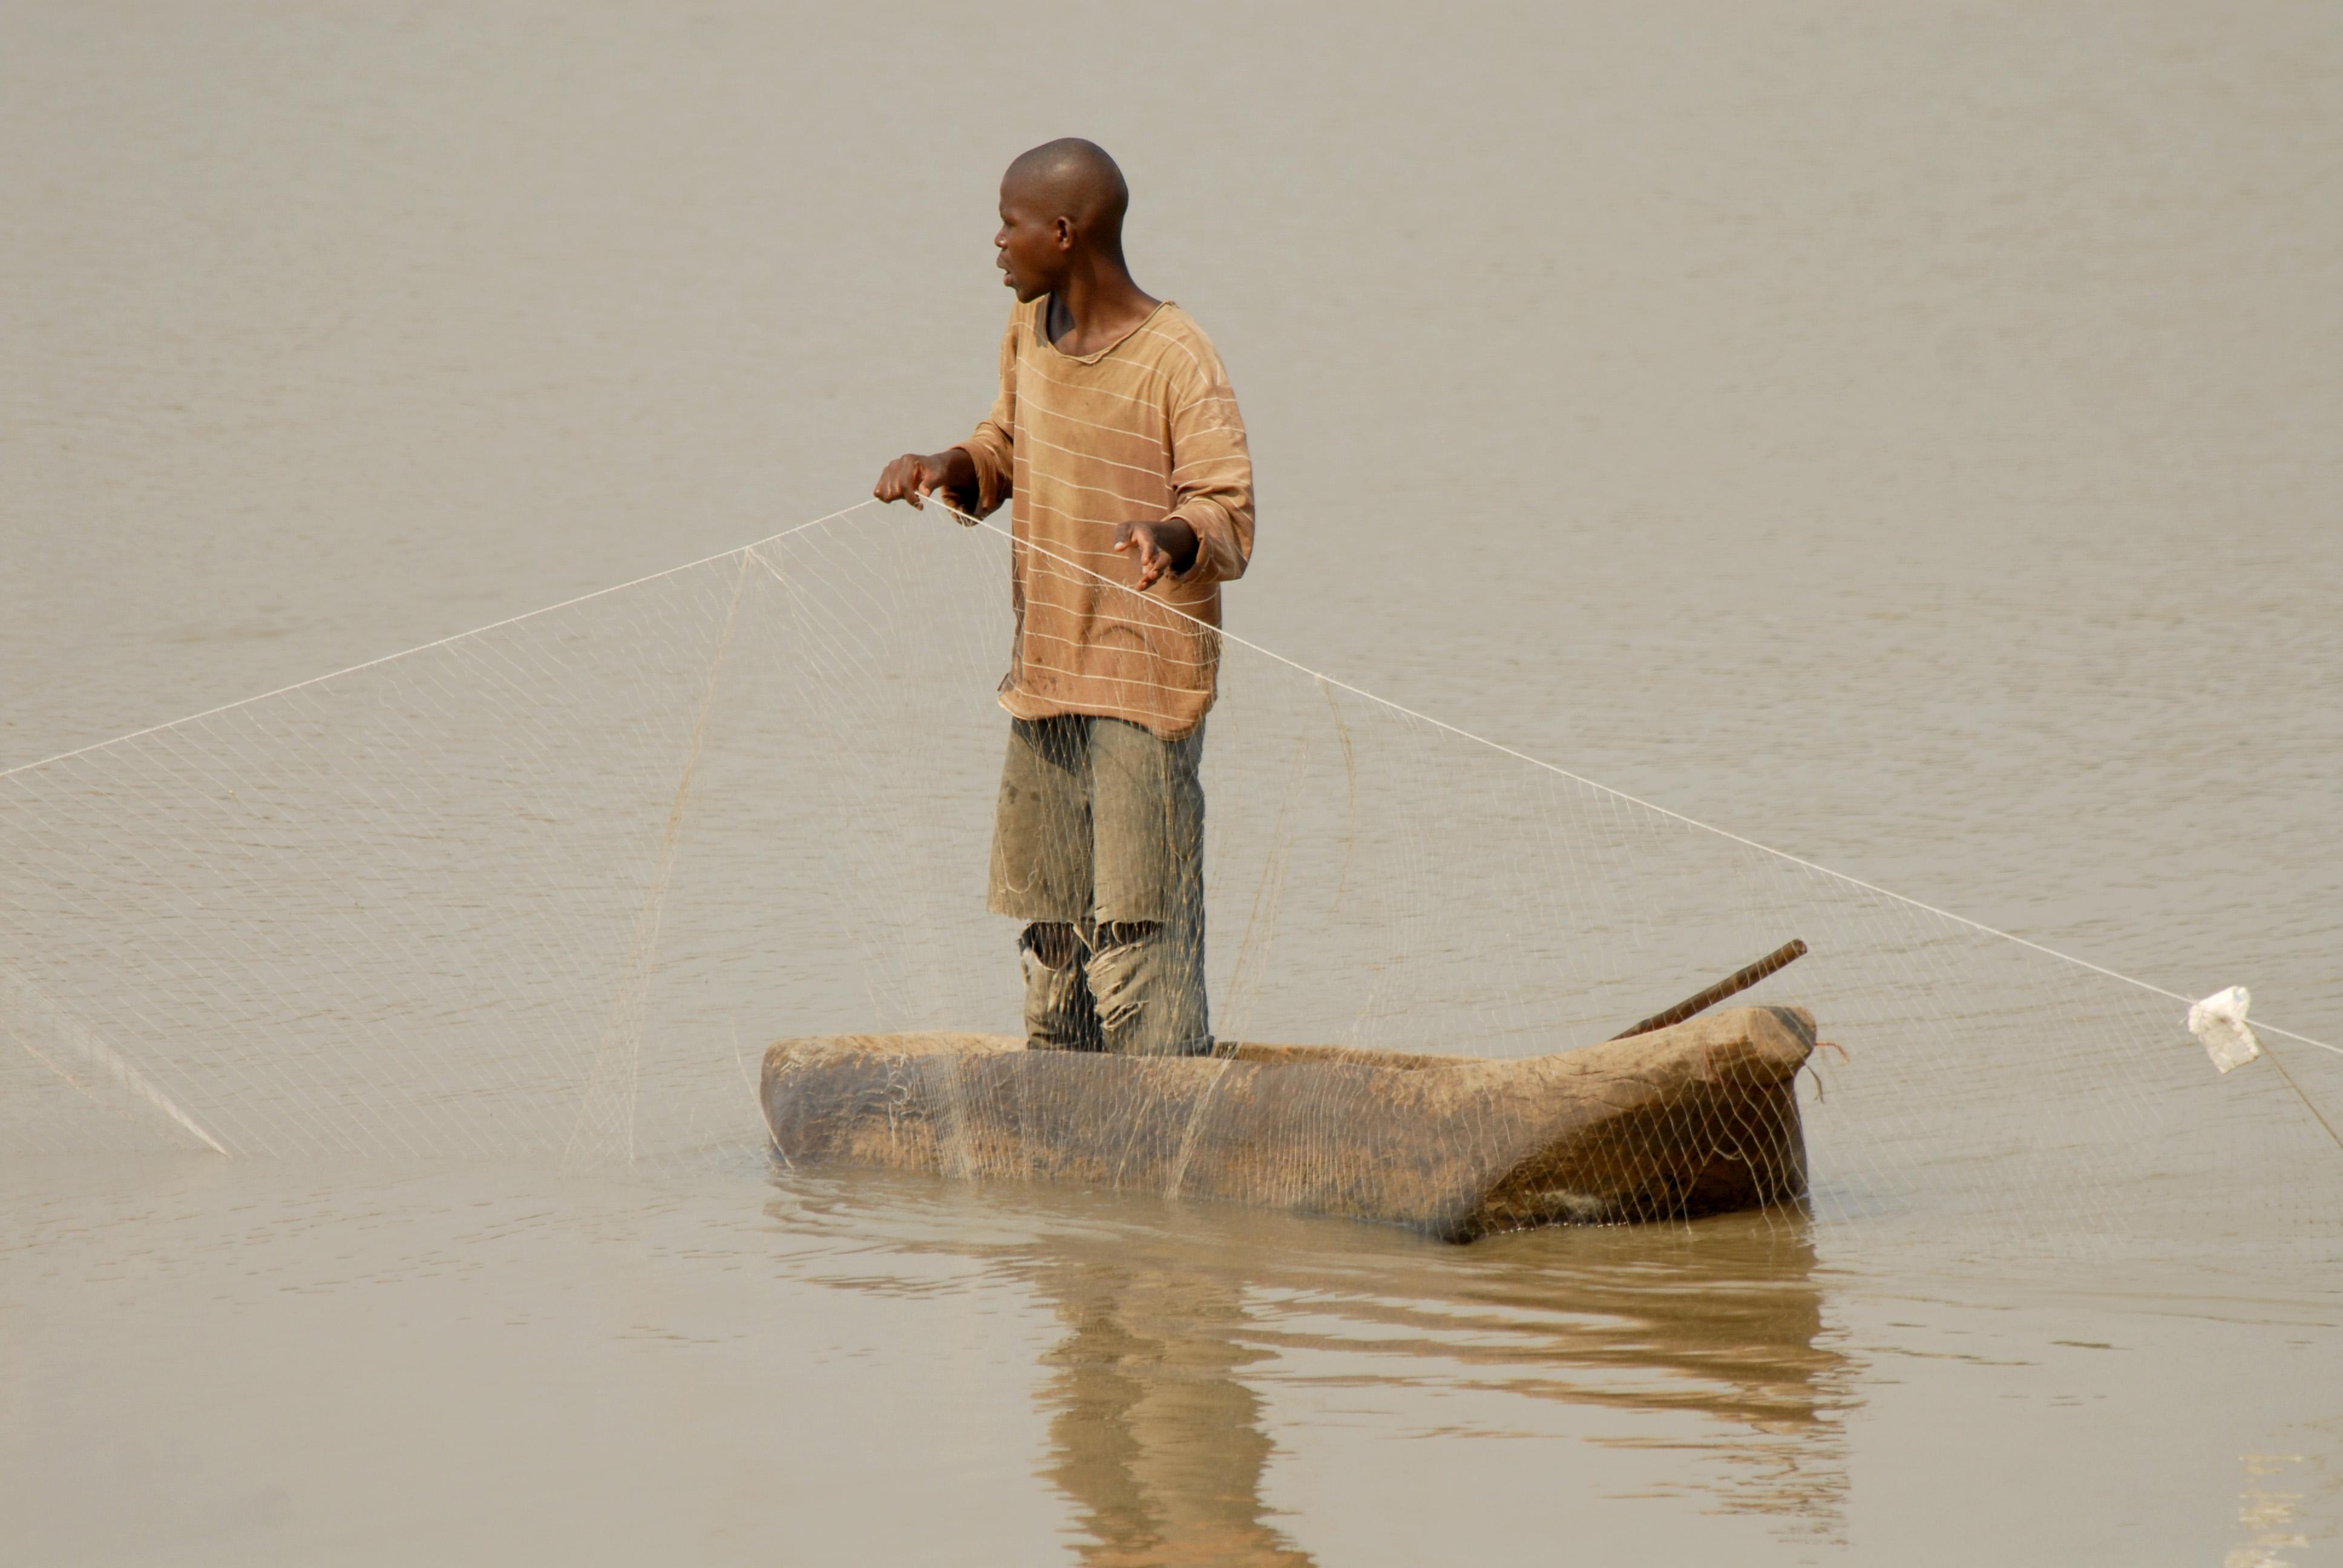 Artisanal fishing gear